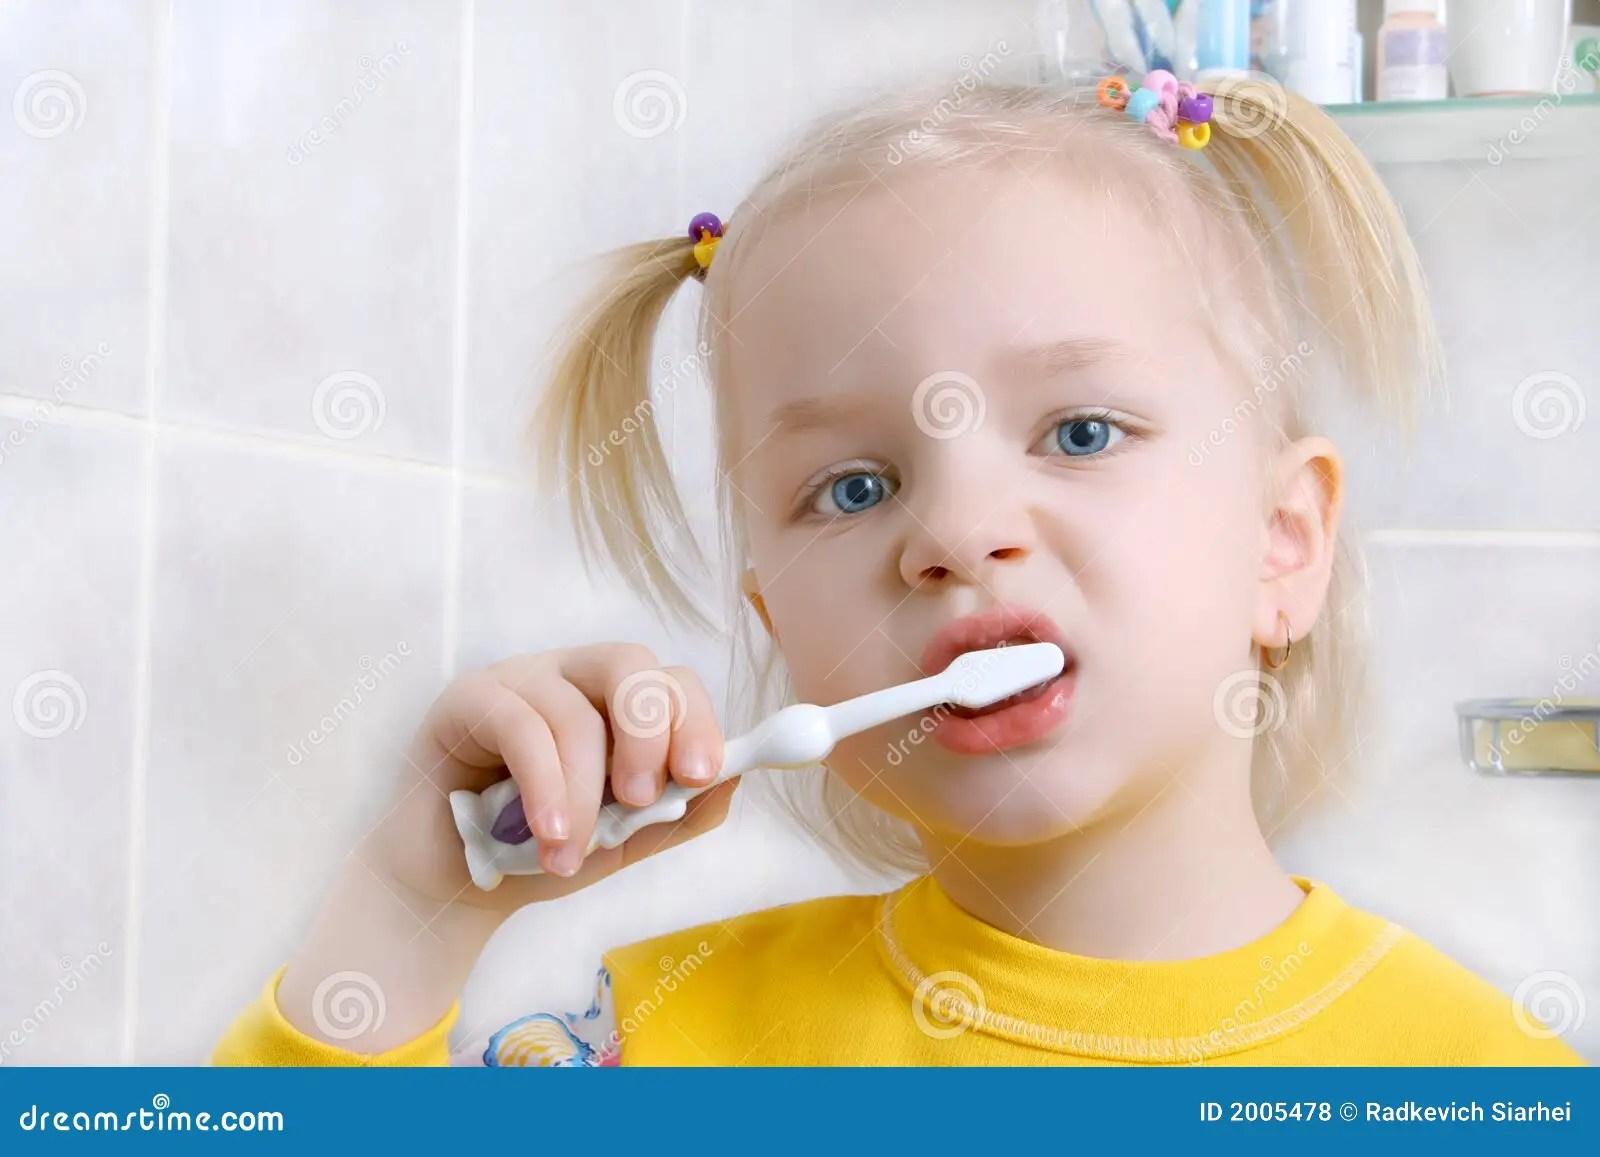 Child Brushing Teeth Stock Photo Image Of People